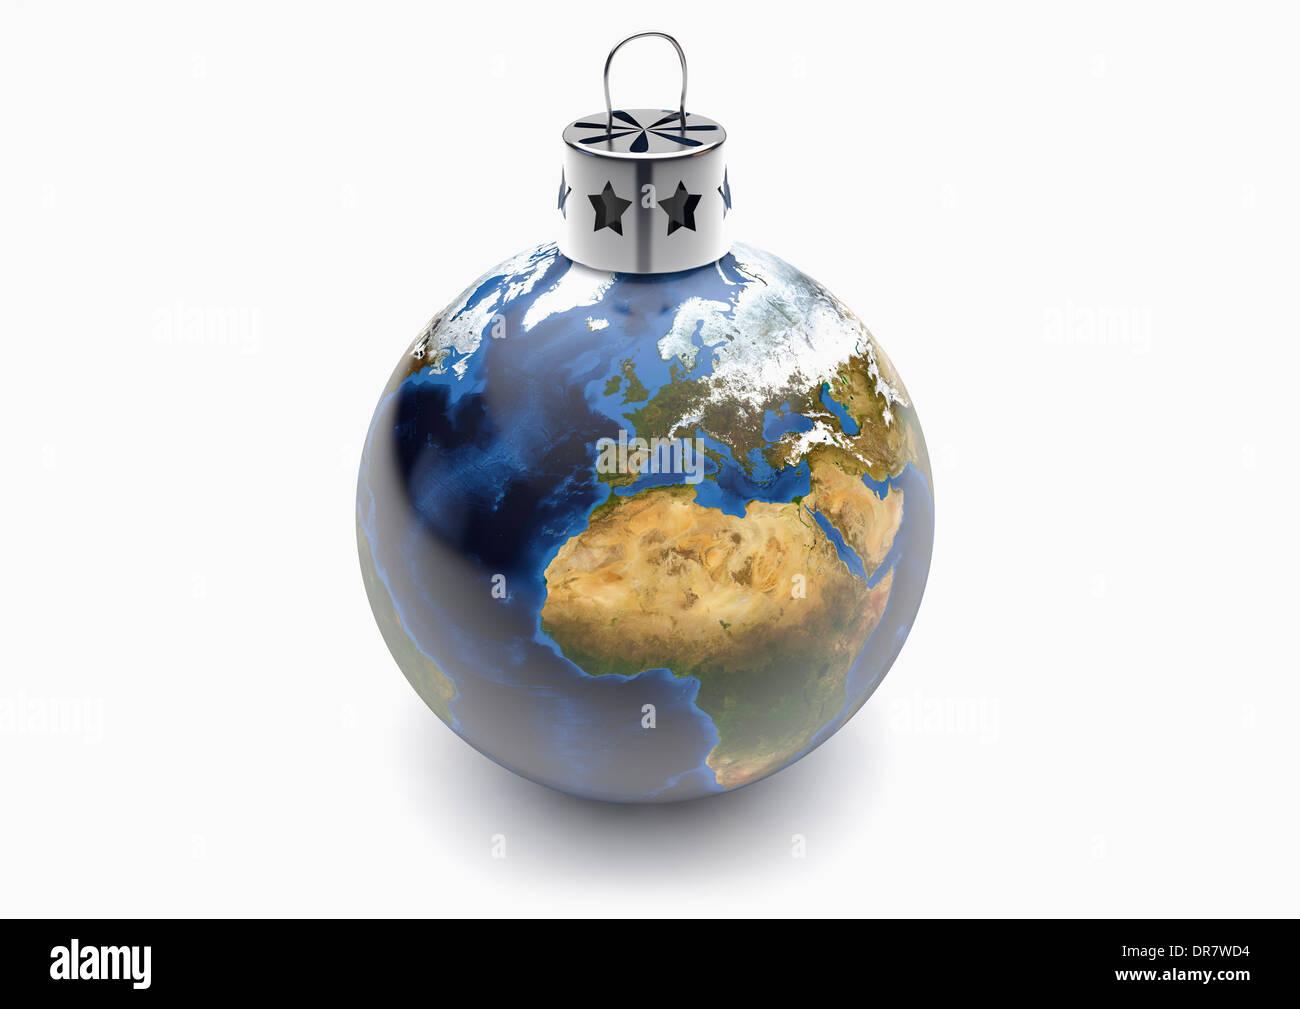 Planet Earth Globe Christmas Tree Bauble Decoration - Stock Image